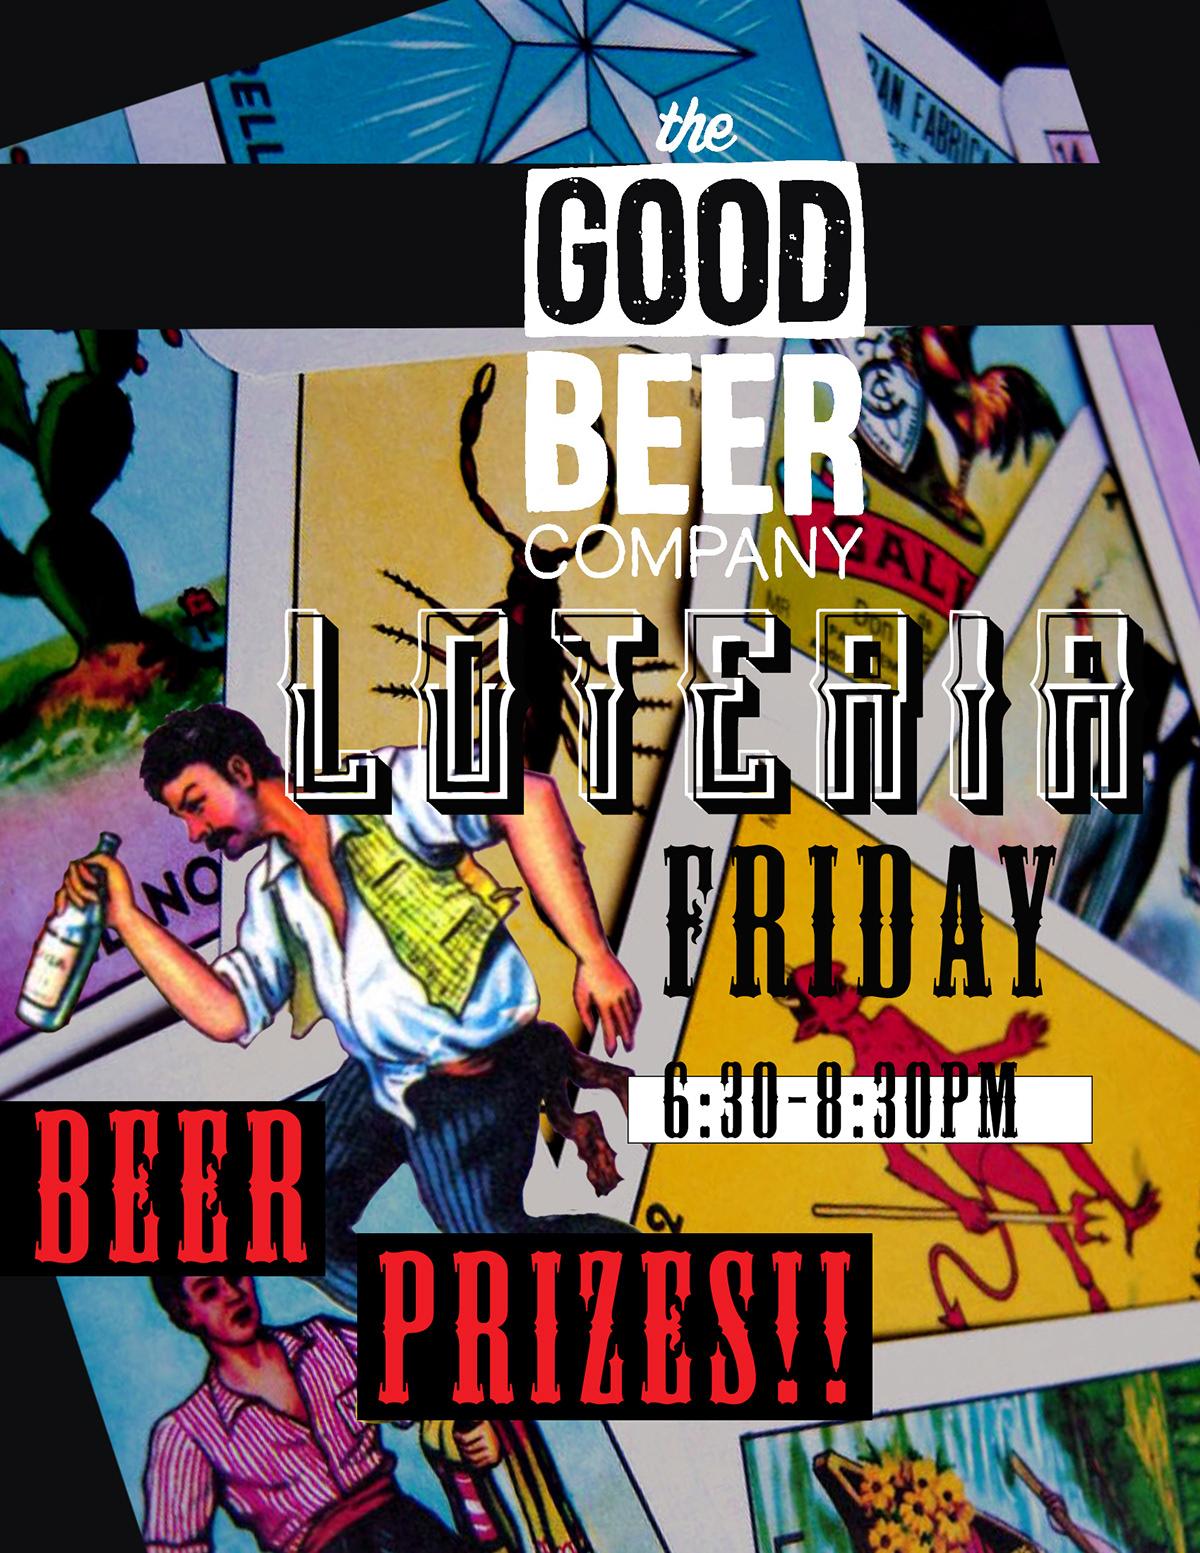 ILLUSTRATION  photoshop Promotion flyer beer Advertising  craftbeer business PUBLISHED Events